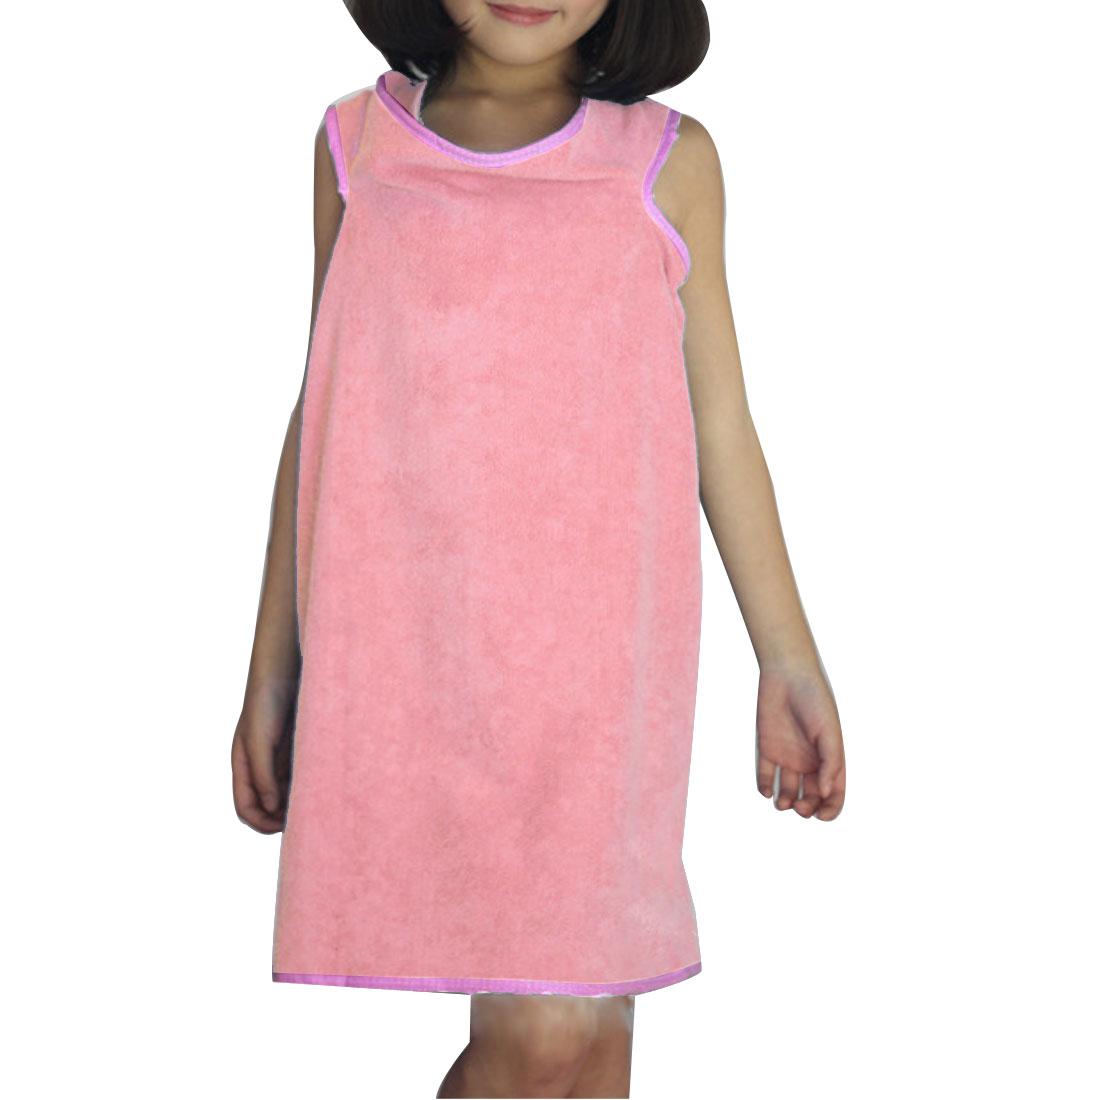 Girl Microfiber Spa Beach Swimming Shower Bath Towel Wrap Skirt Washcloth Pink